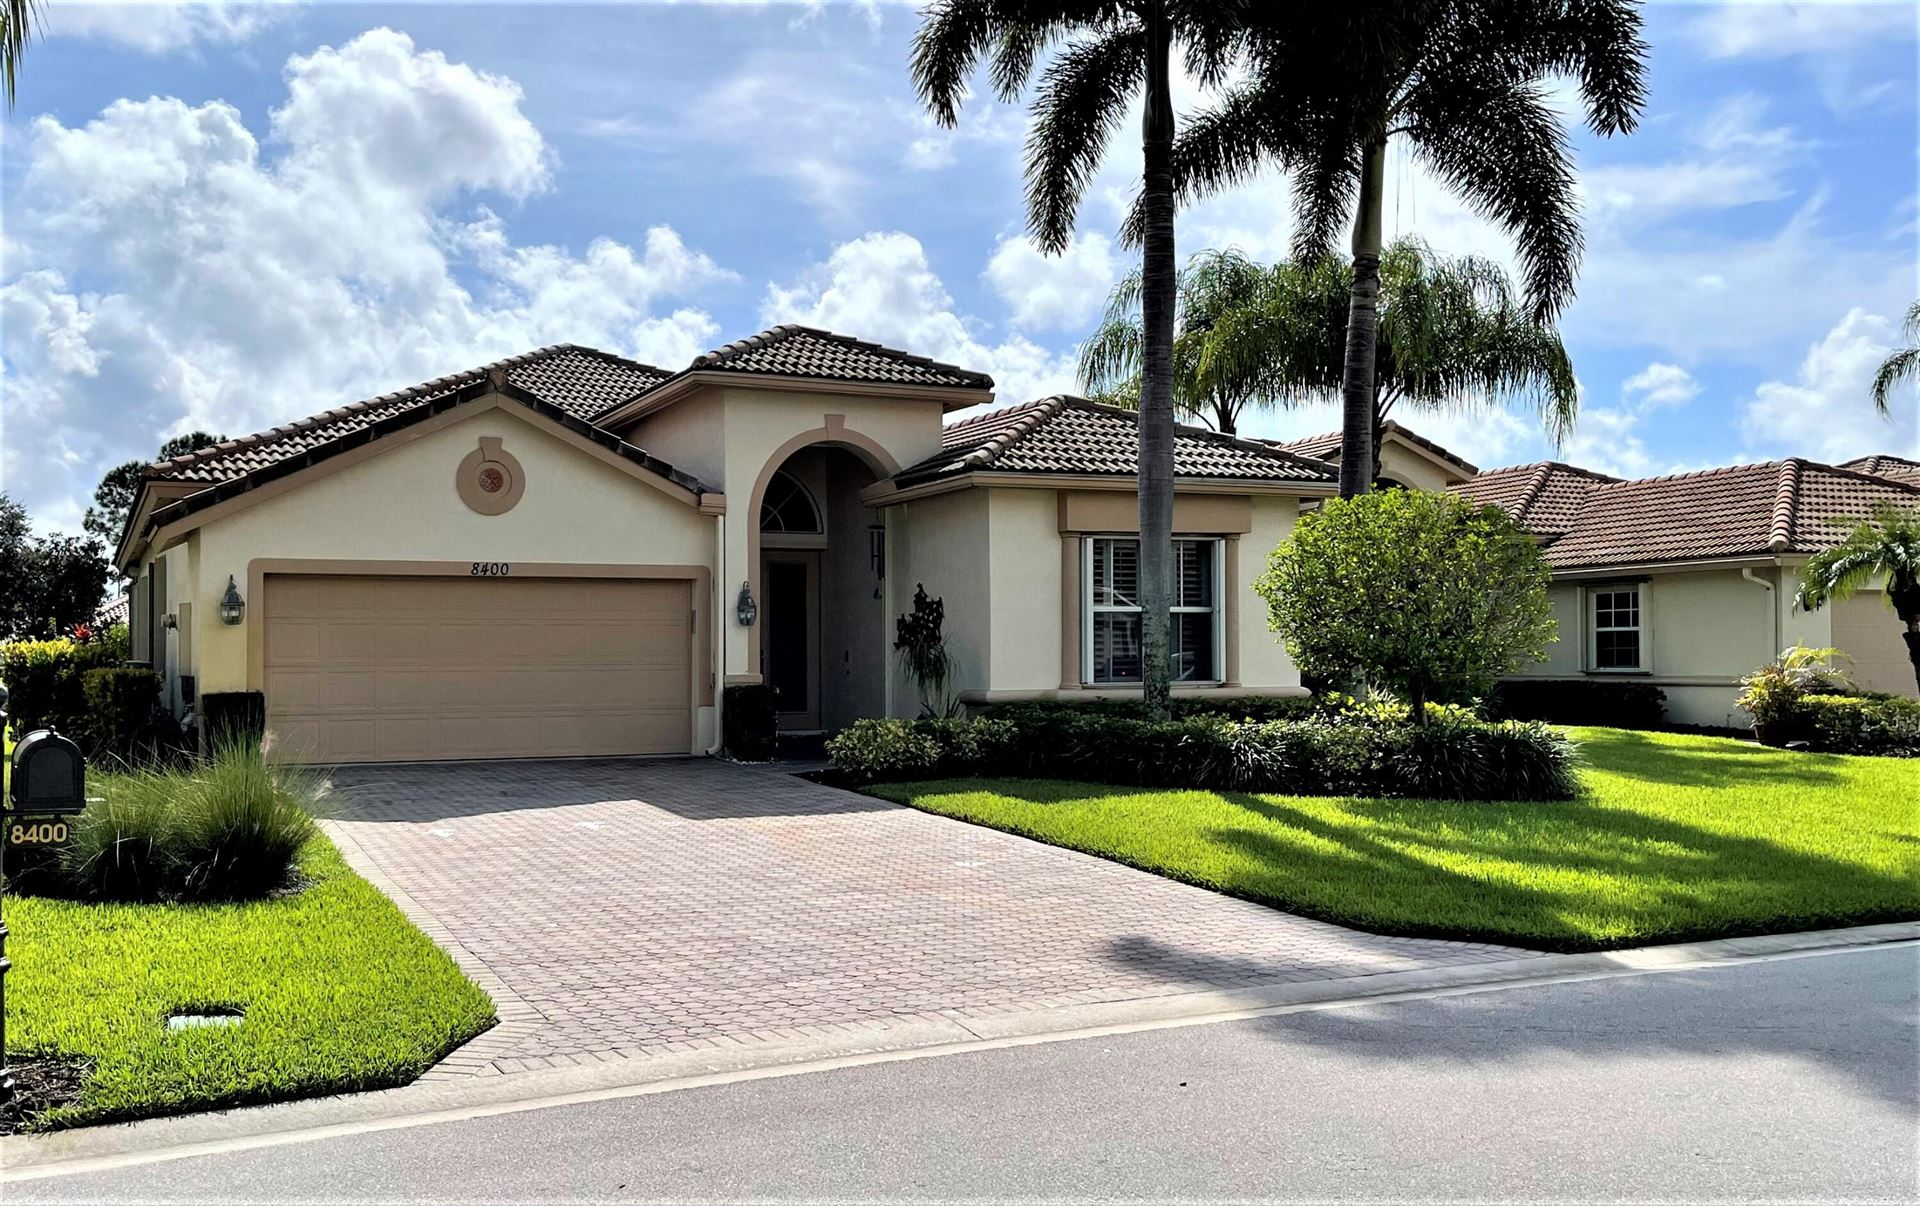 Photo of 8400 Muirfield Way, Saint Lucie West, FL 34986 (MLS # RX-10740973)